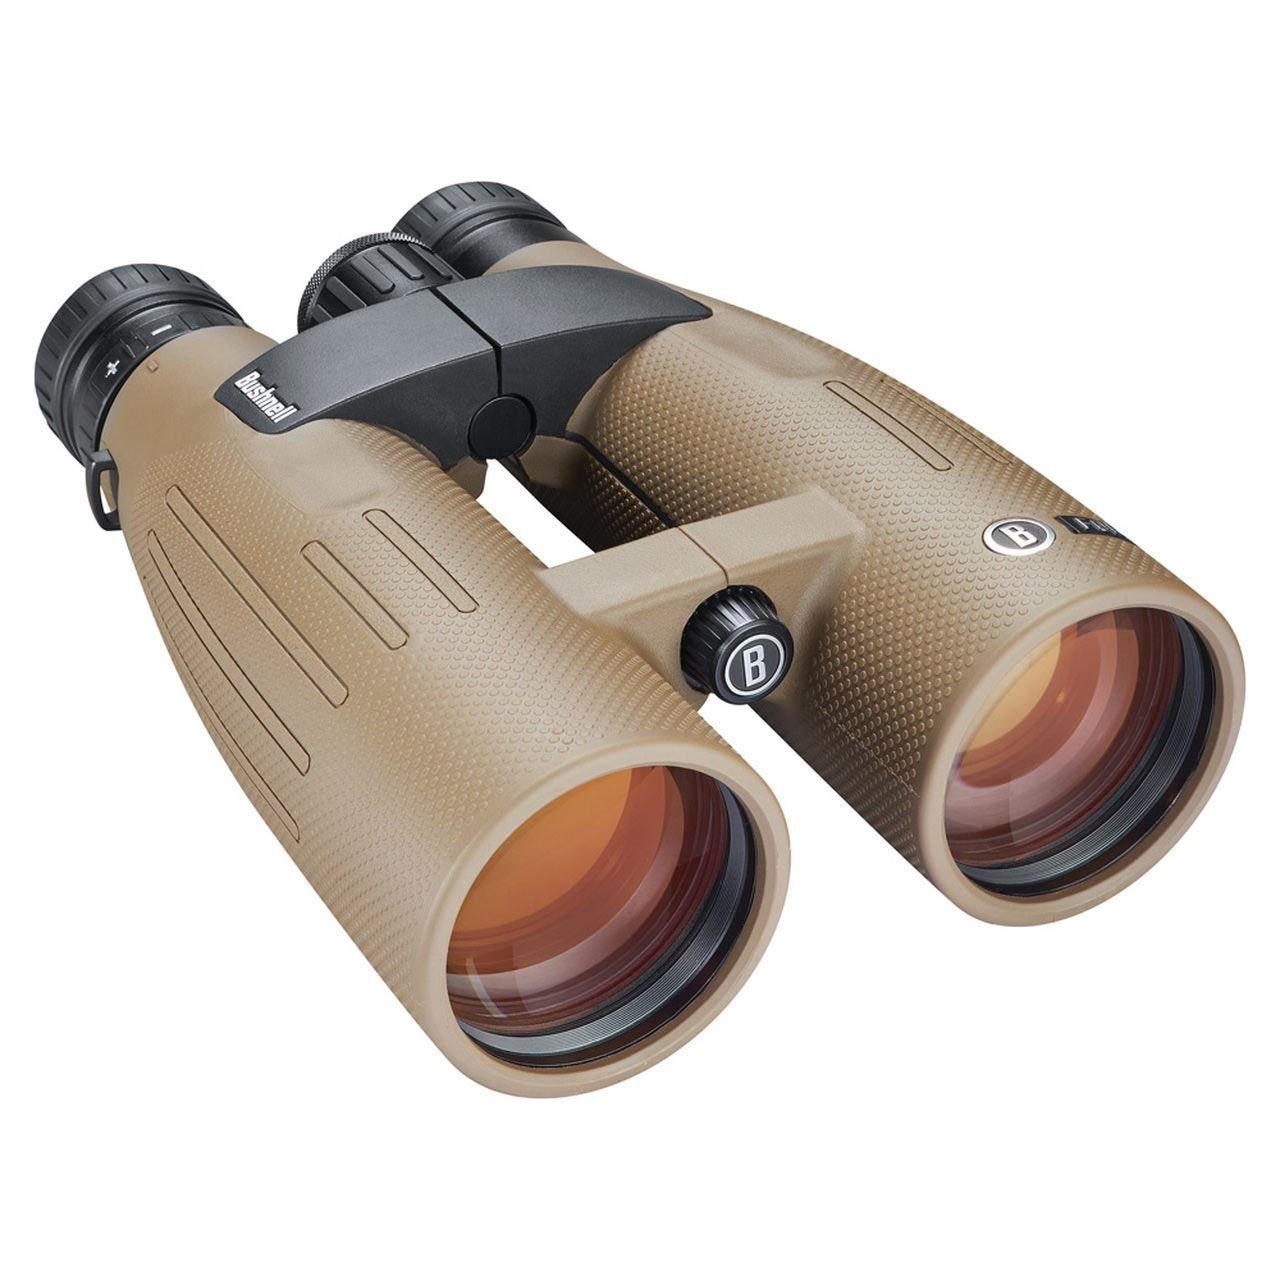 Image of Bushnell Forge 15x56 Binoculars